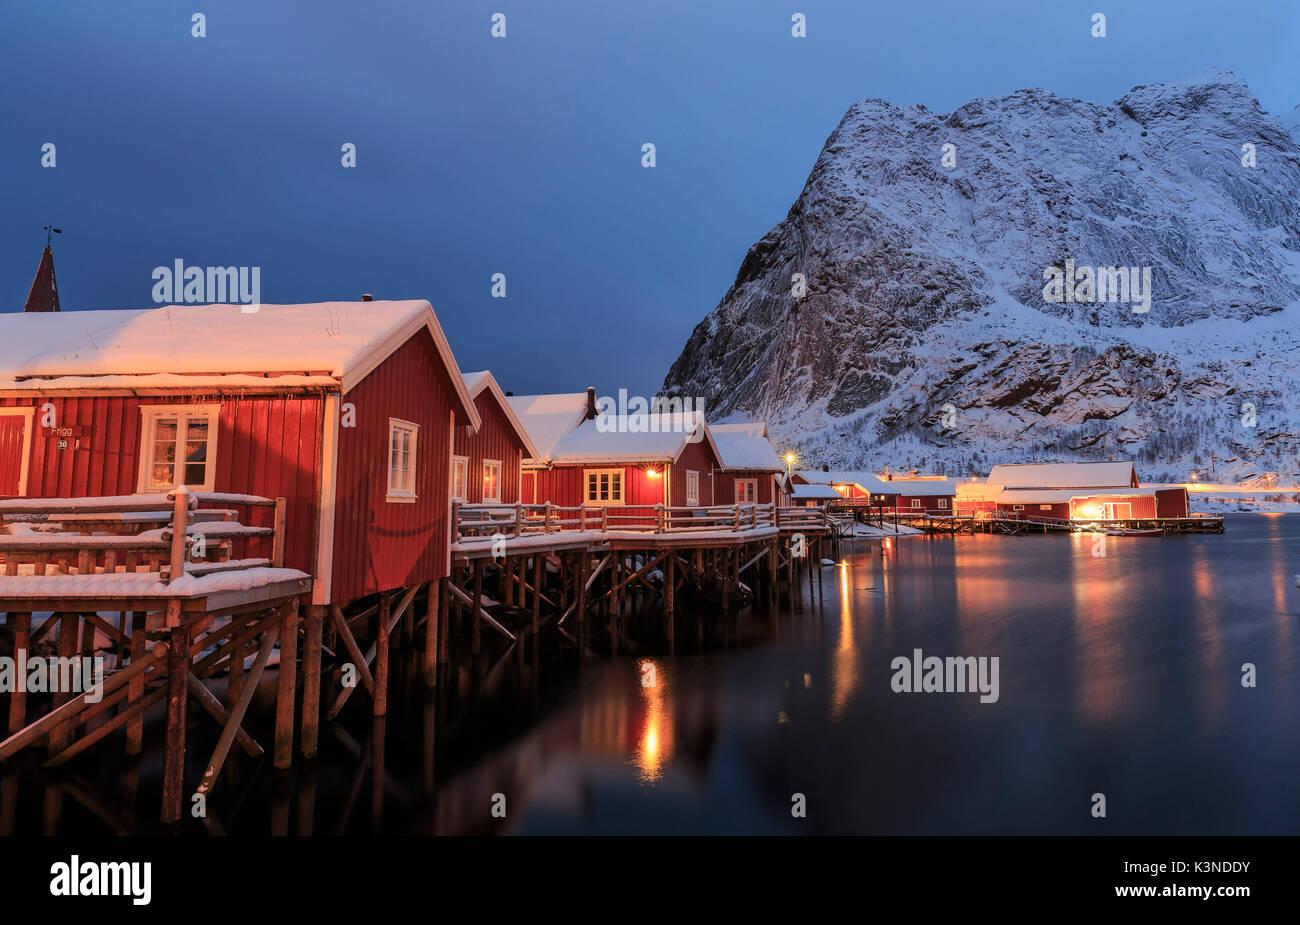 Typical homes of the fishermen of Reine fishing village, lofoten Islands, Norway - Stock Image